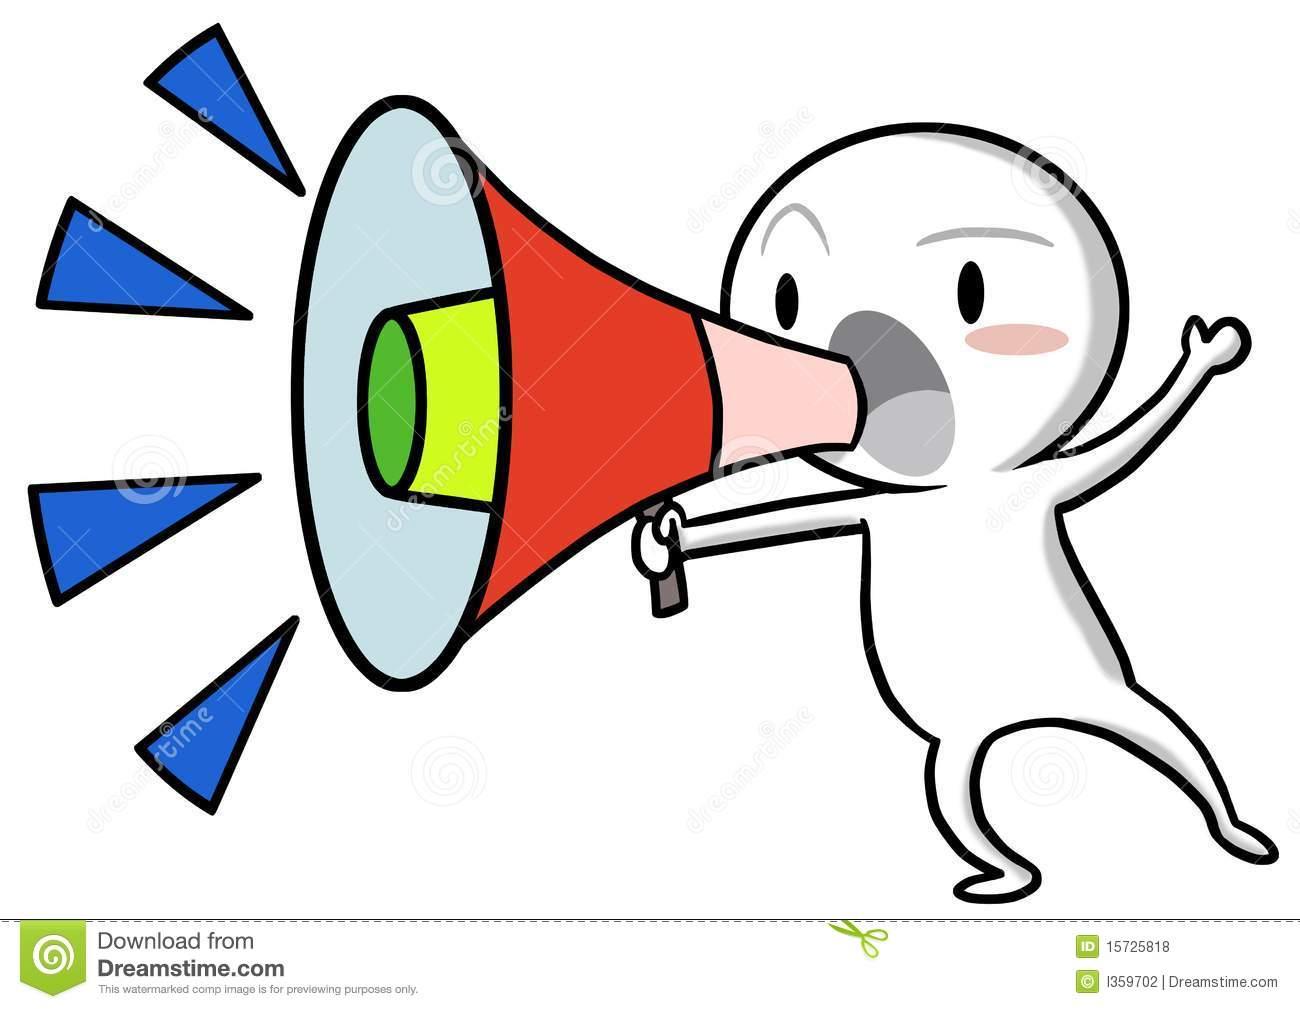 voice clipart clipart panda free clipart images rh clipartpanda com cheerleader megaphone clipart free Cheer Megaphone Clip Art